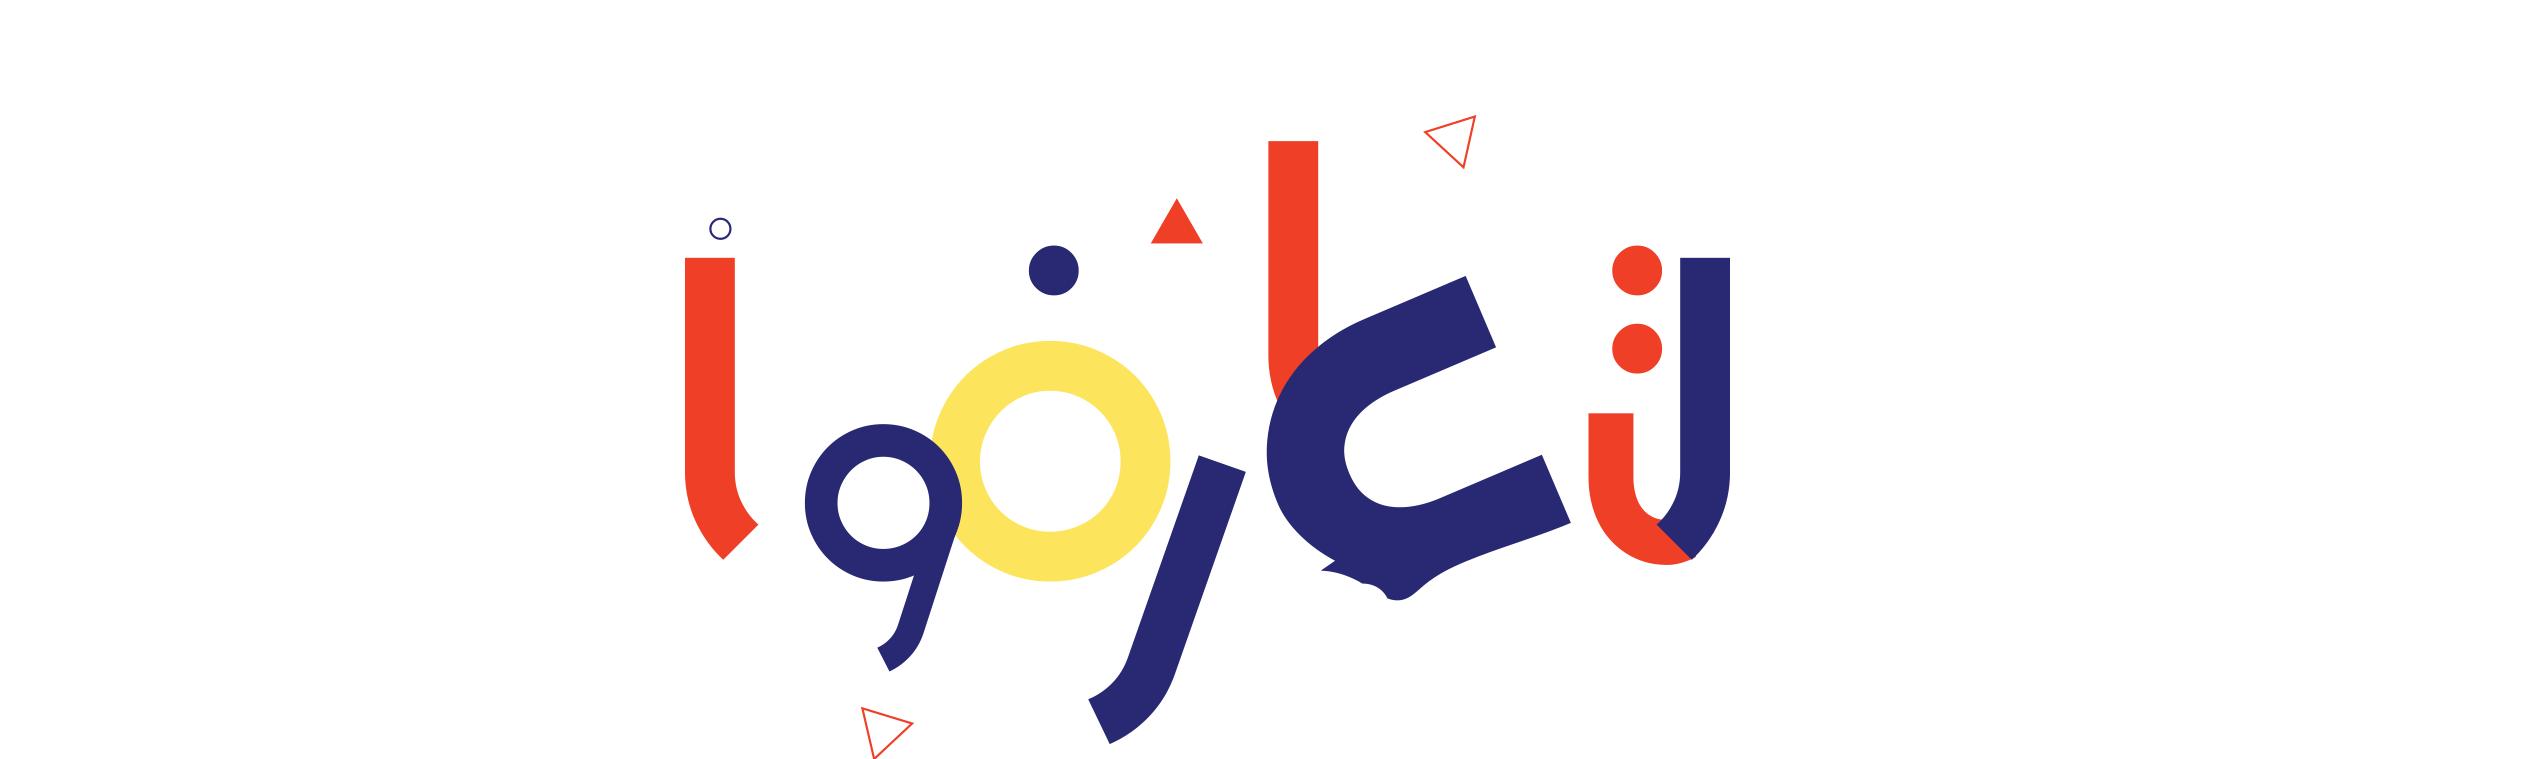 litaearafuu logo version 1 momenarts